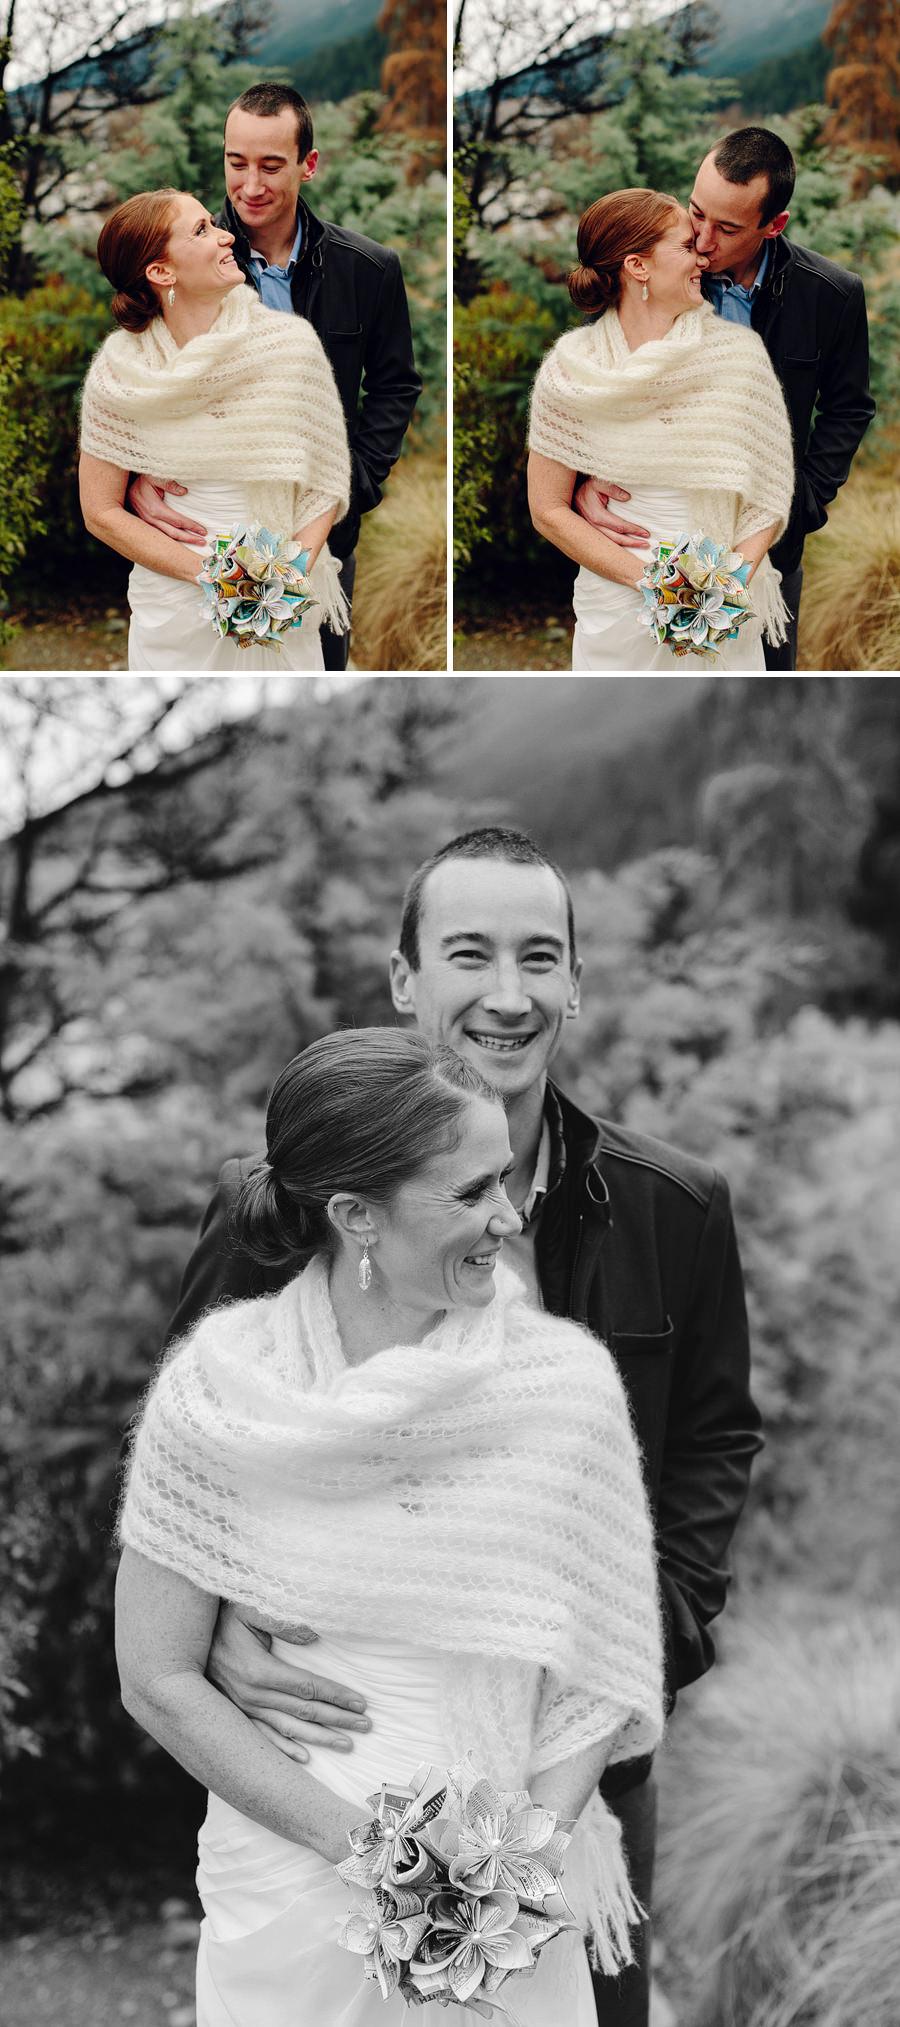 Destination Wedding Photographers: Bride & Groom portraits